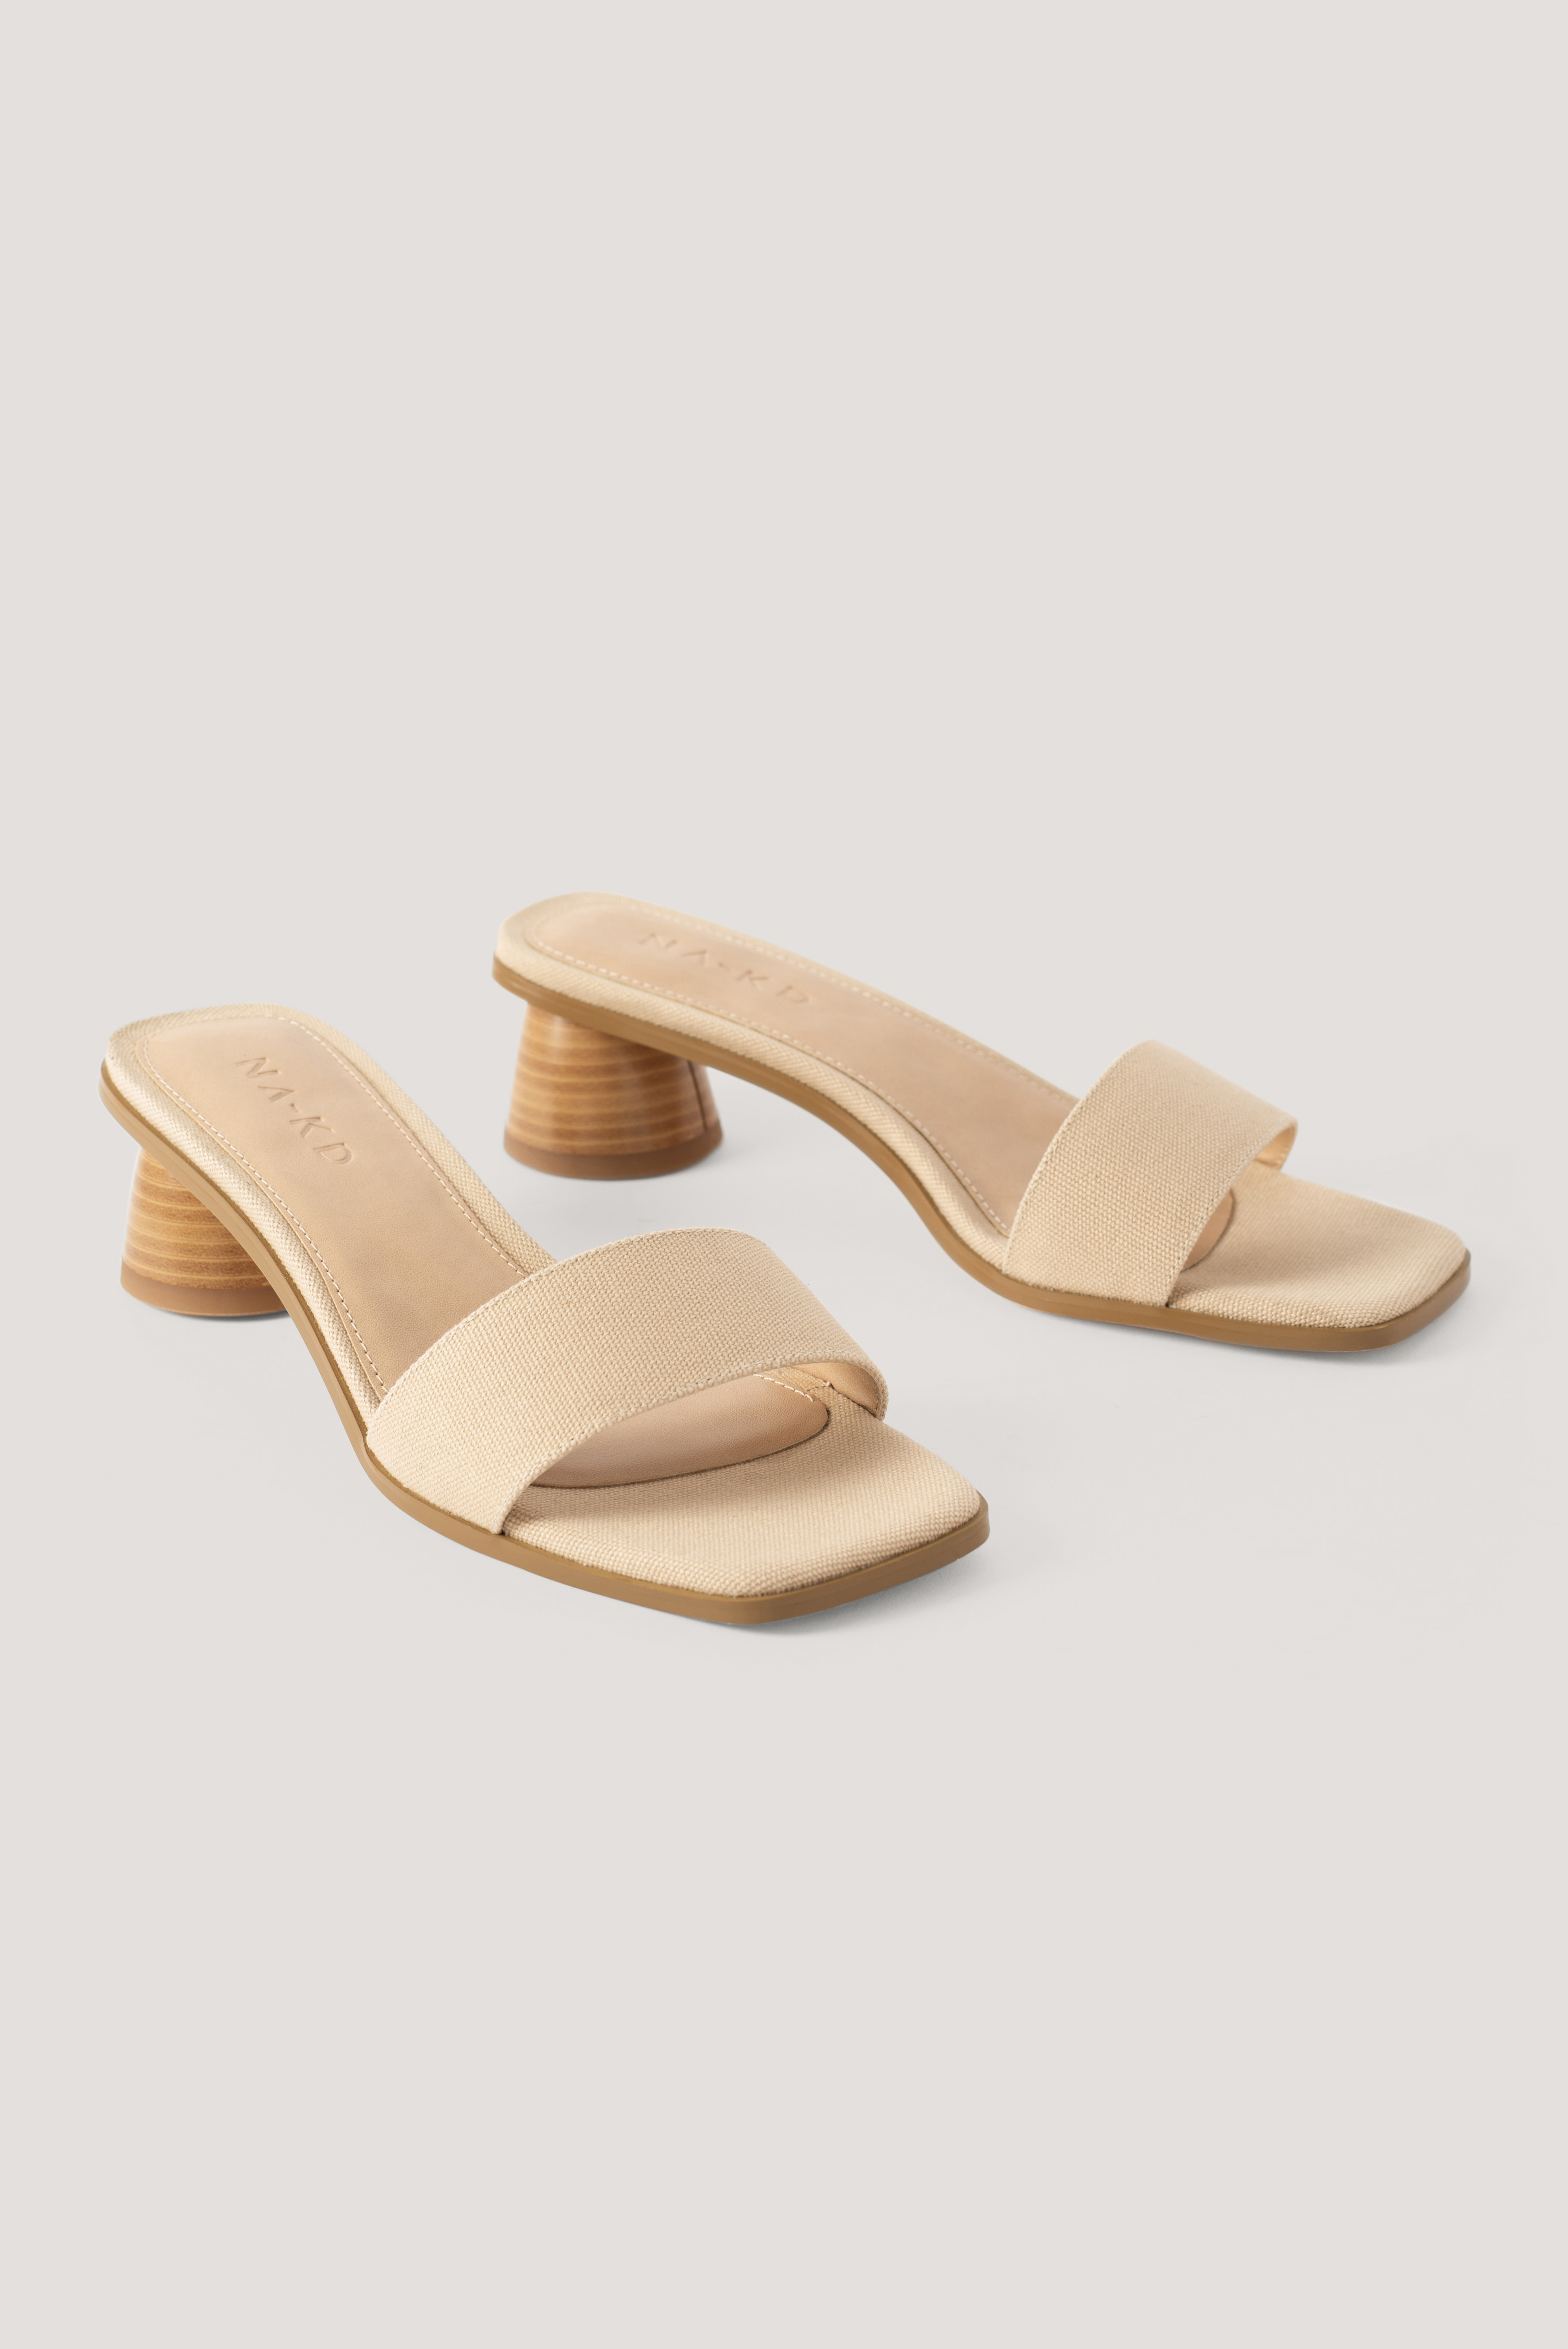 na-kd shoes -  Pantolette - Beige